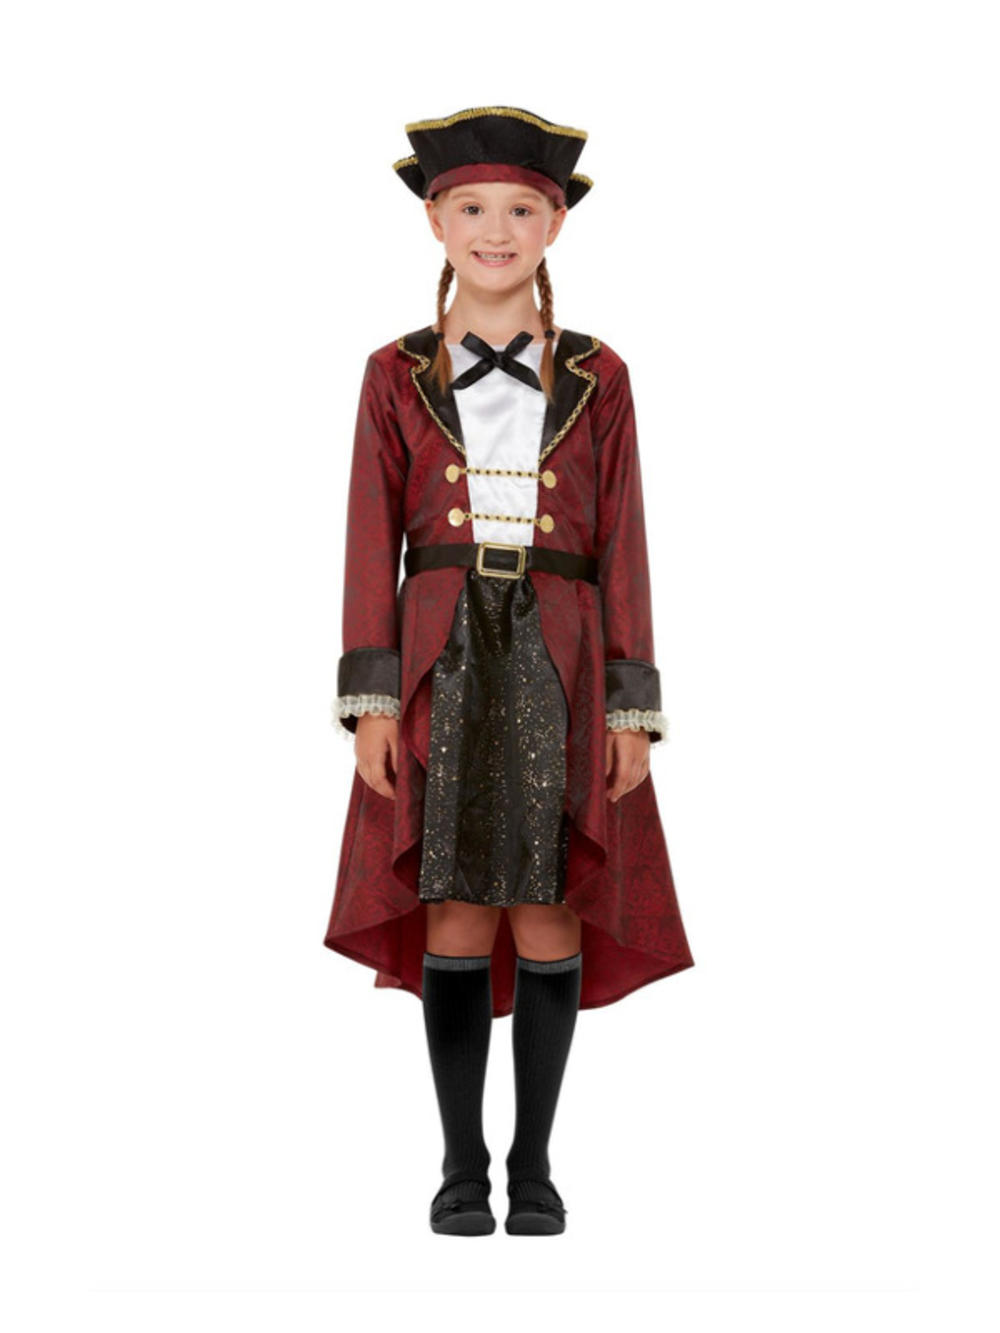 Swashbuckler Pirate Girls Costume